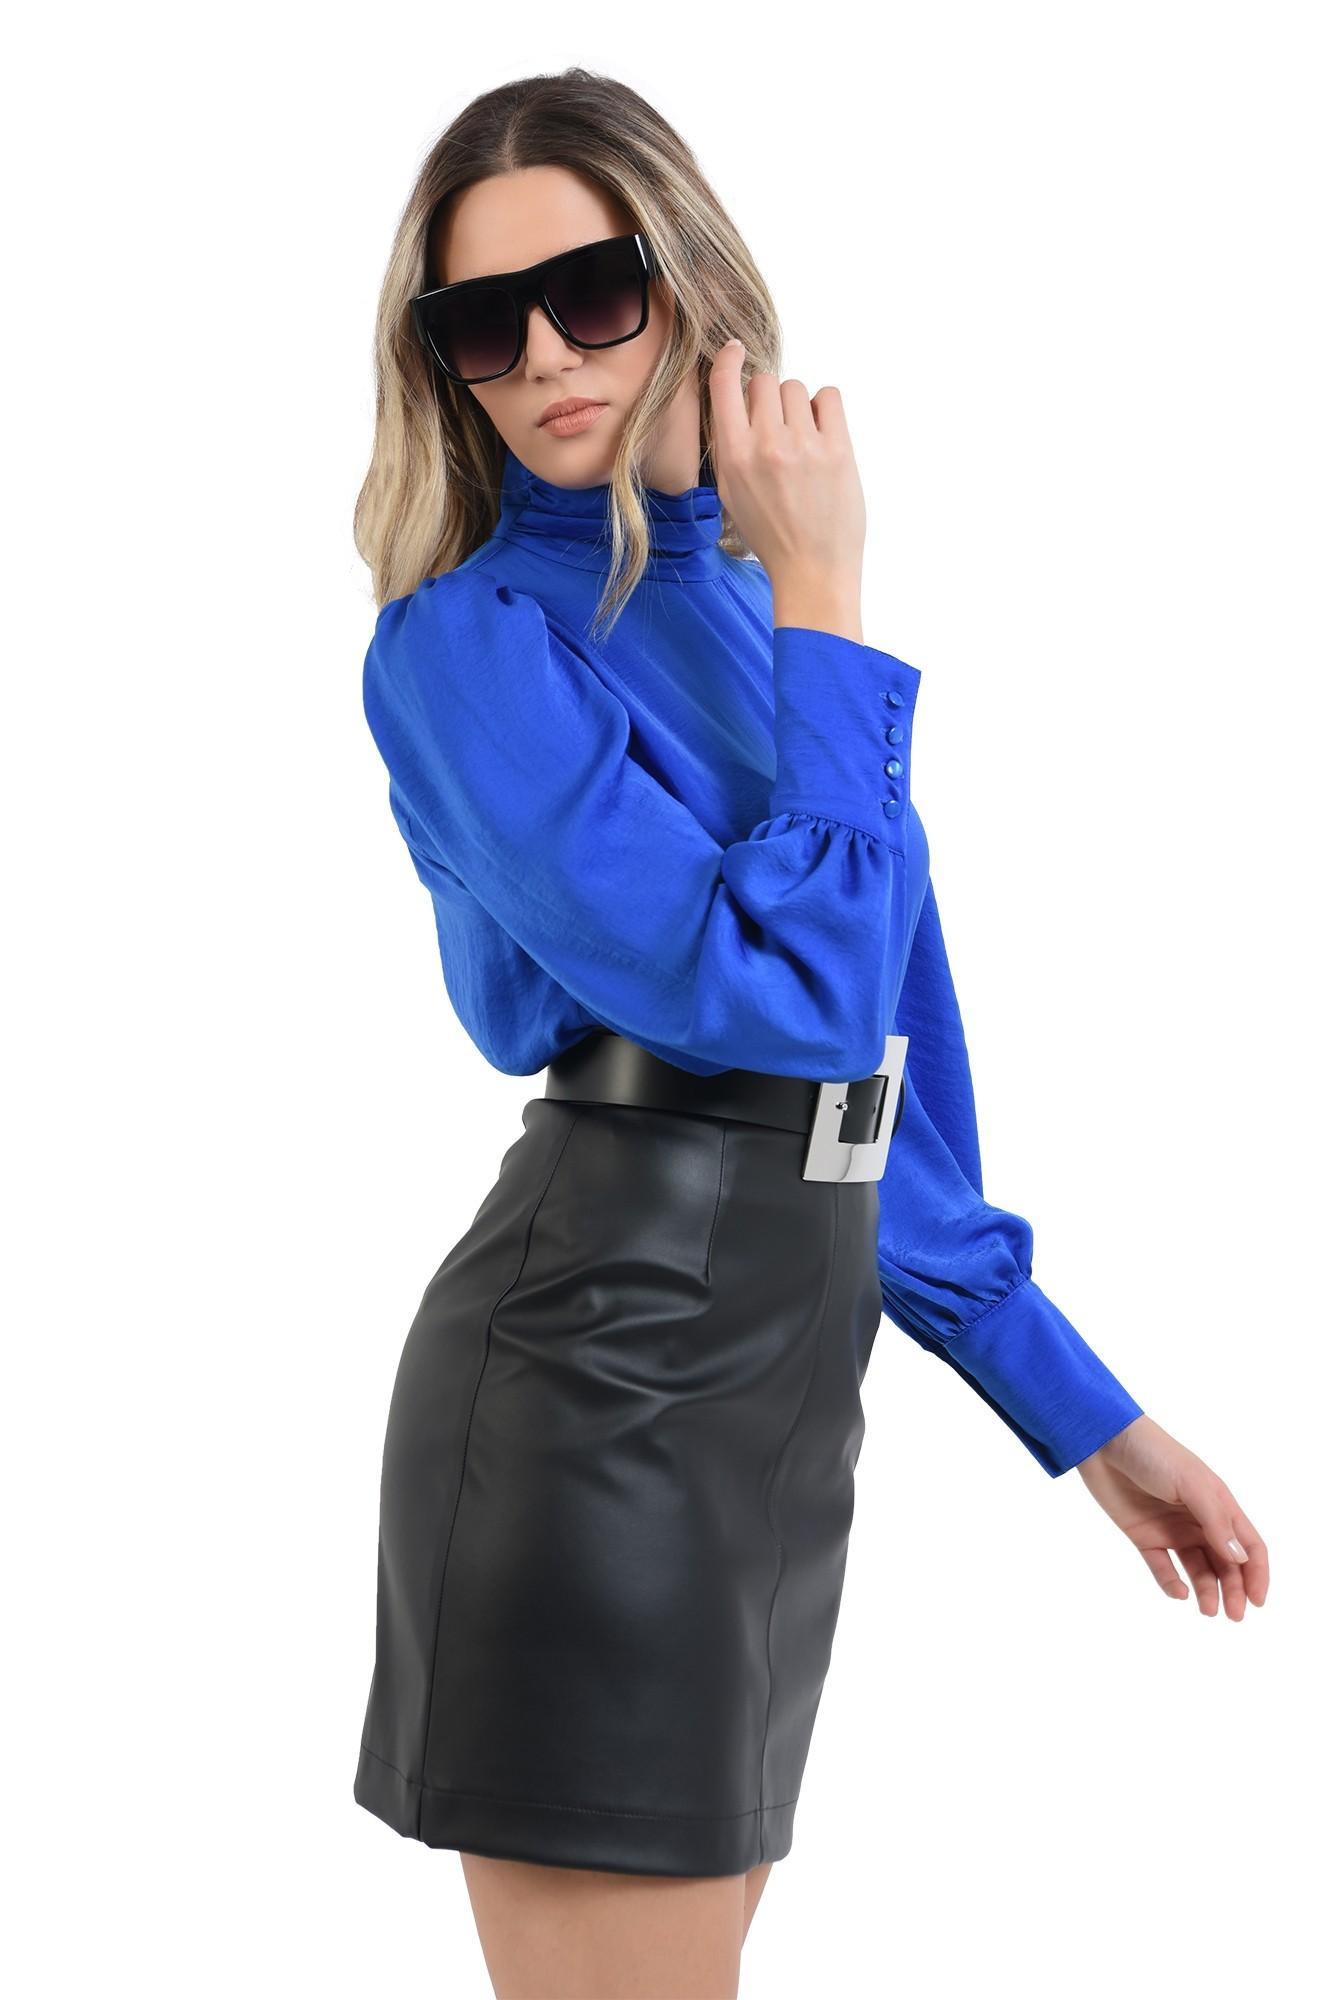 360 - bluza cu pliuri la gat, albastra, cu nasturi la manseta